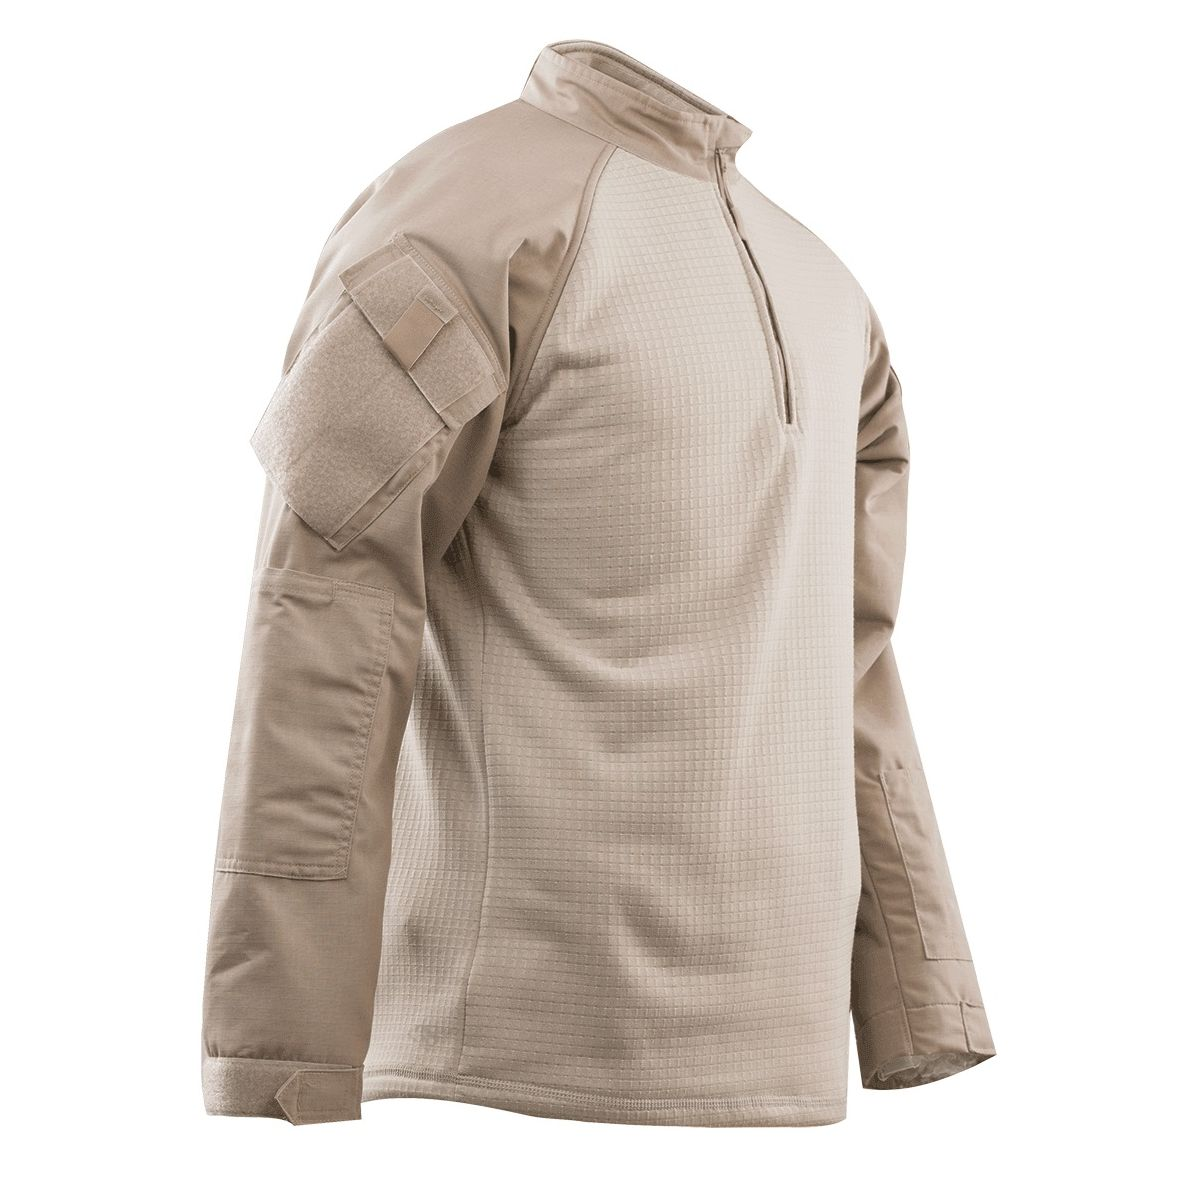 Košile taktická 1/4 zip COLD WEATHER KHAKI TRU-SPEC 2589000 L-11